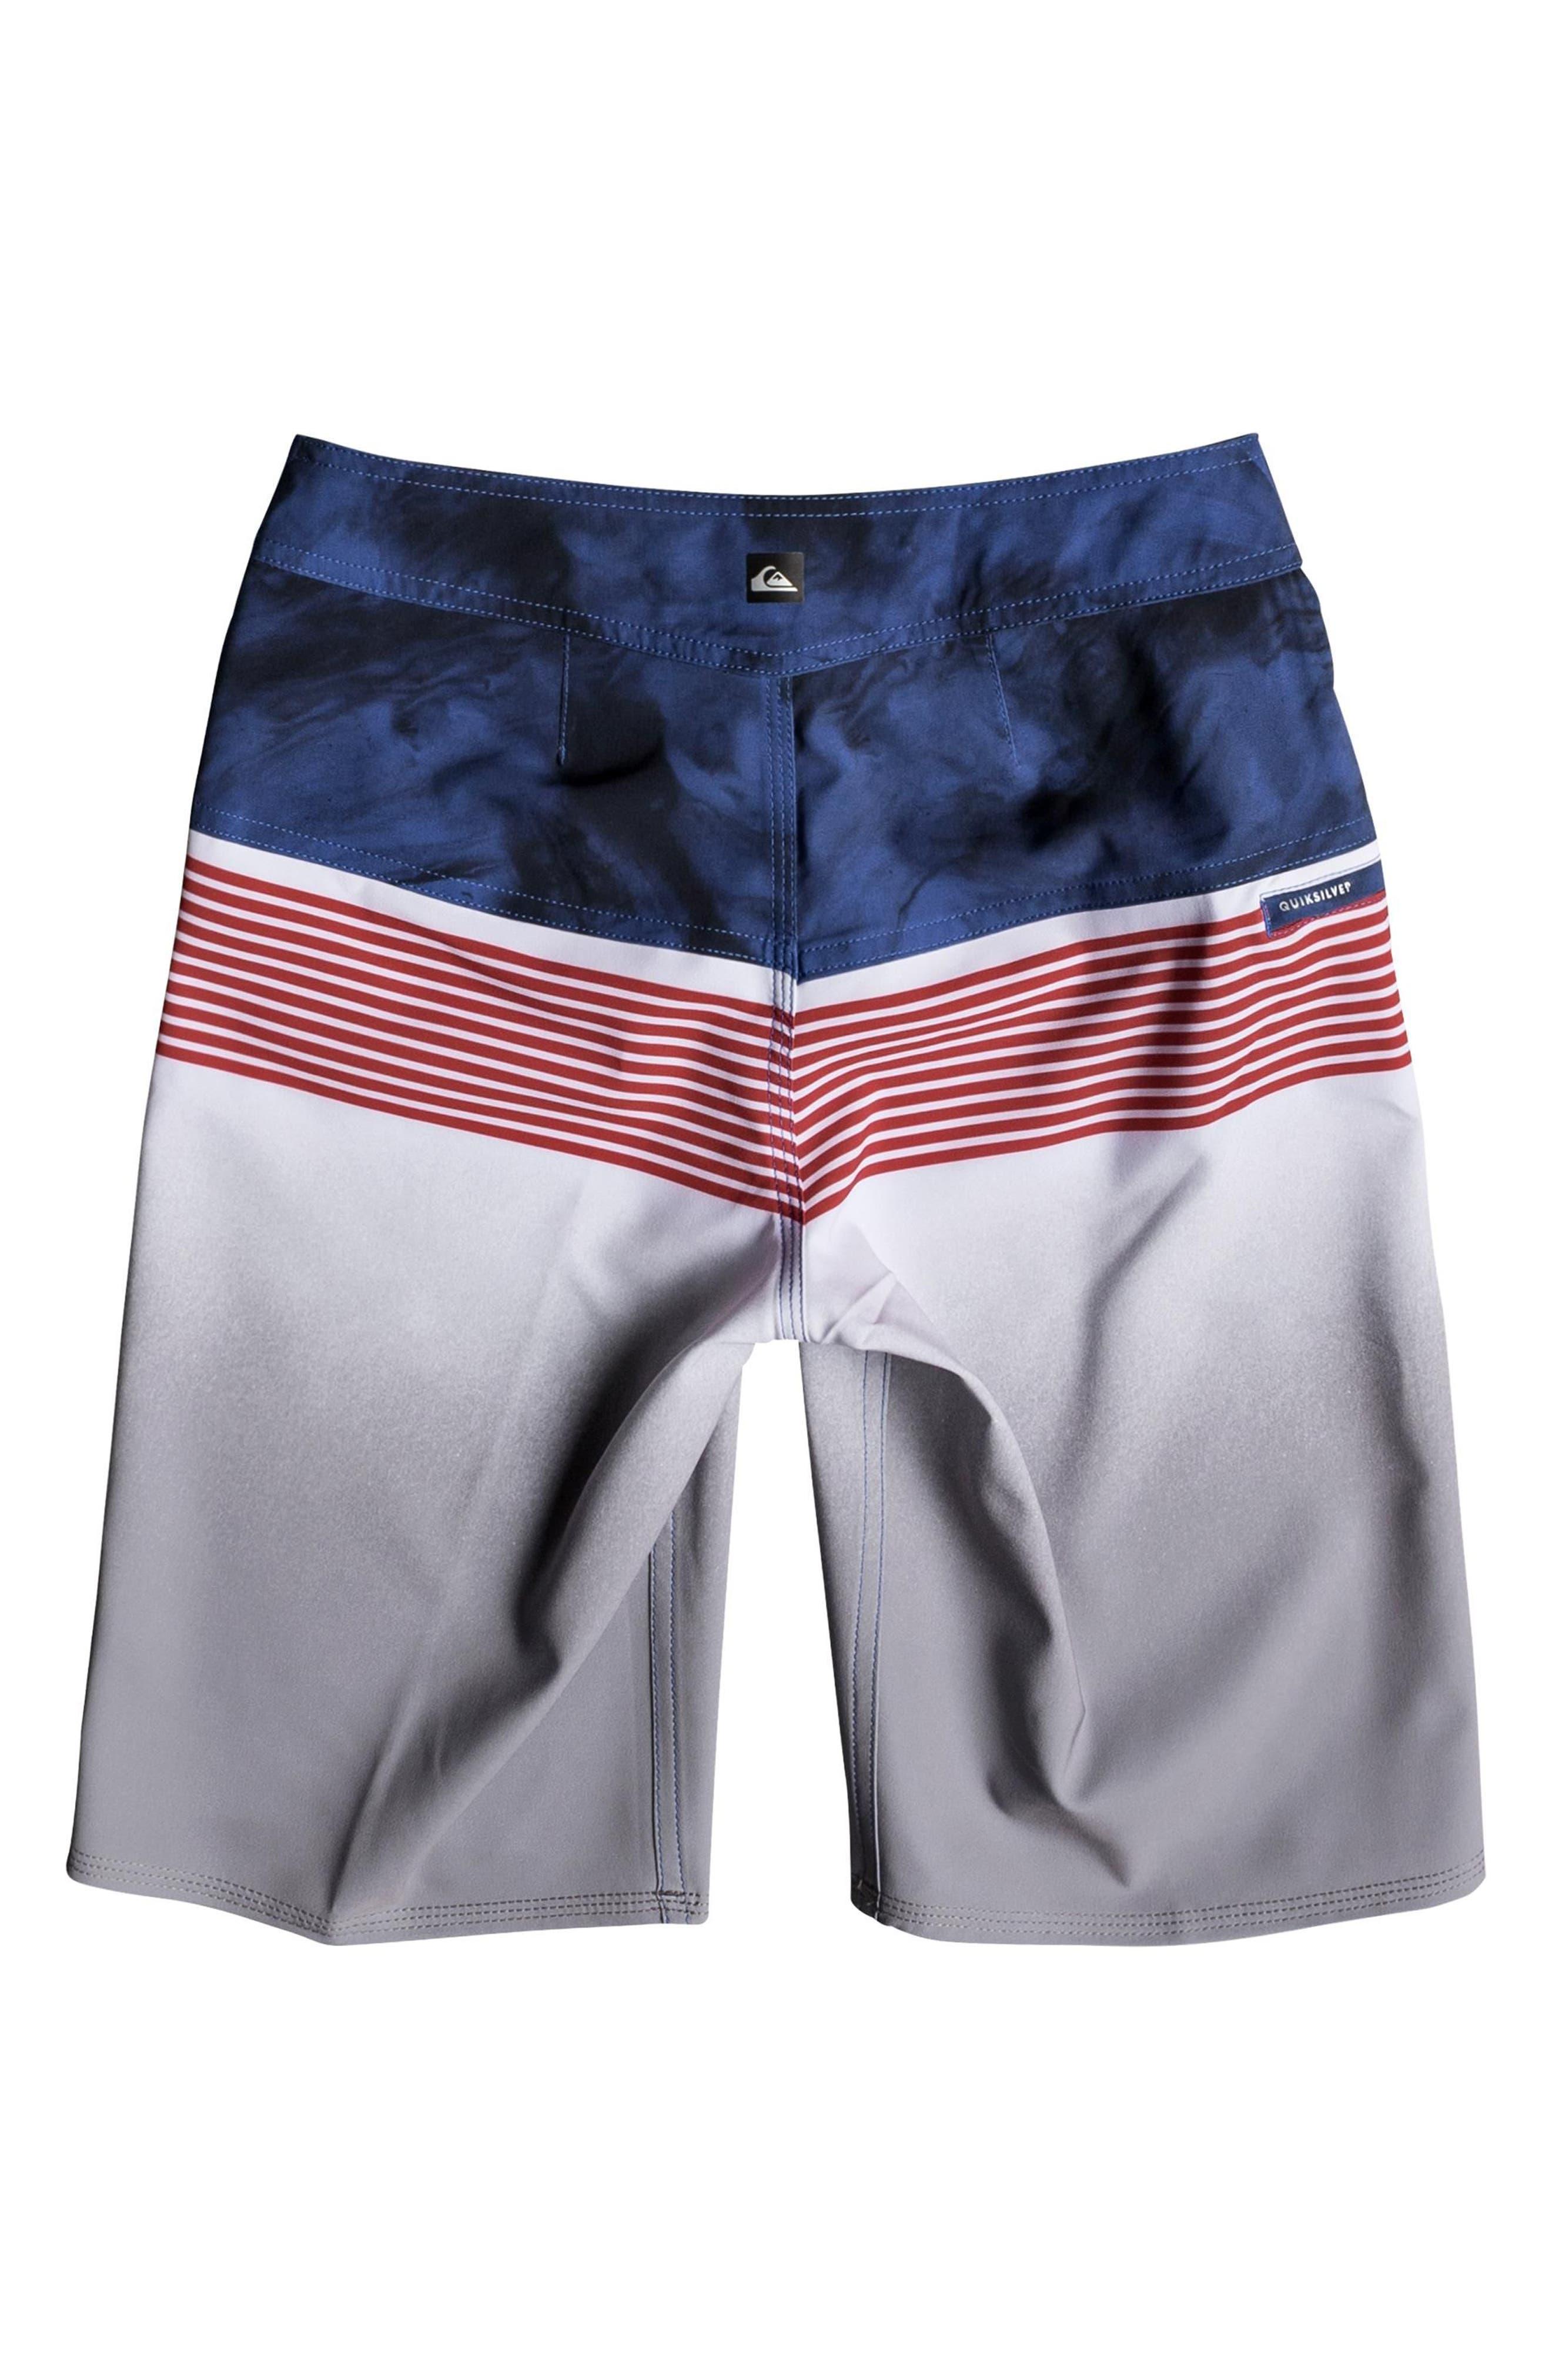 Highline Lava Board Shorts,                             Alternate thumbnail 2, color,                             101